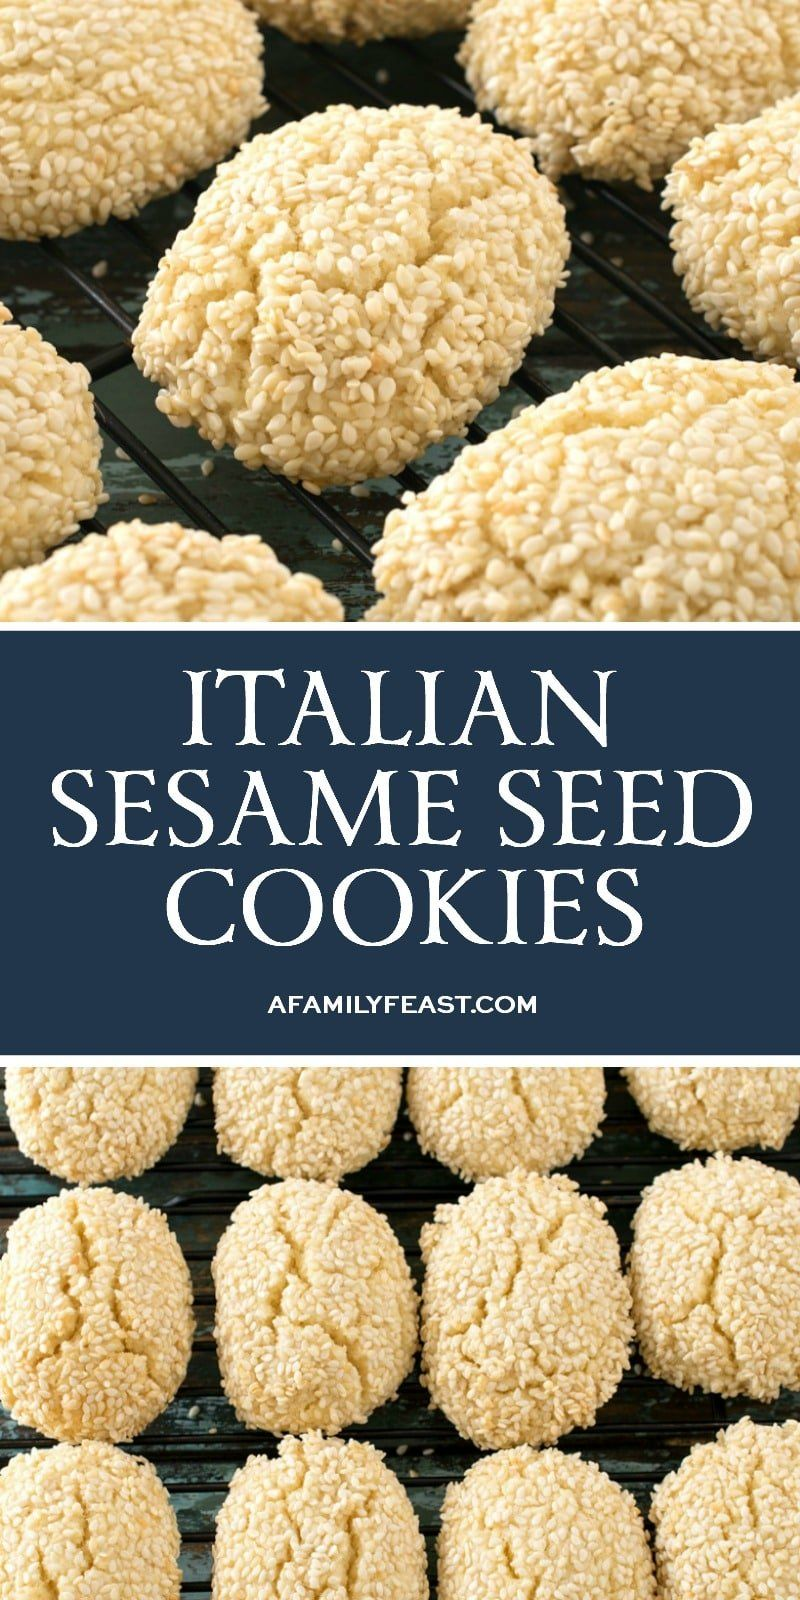 Italian Sesame Seed Cookies - A Family Feast®